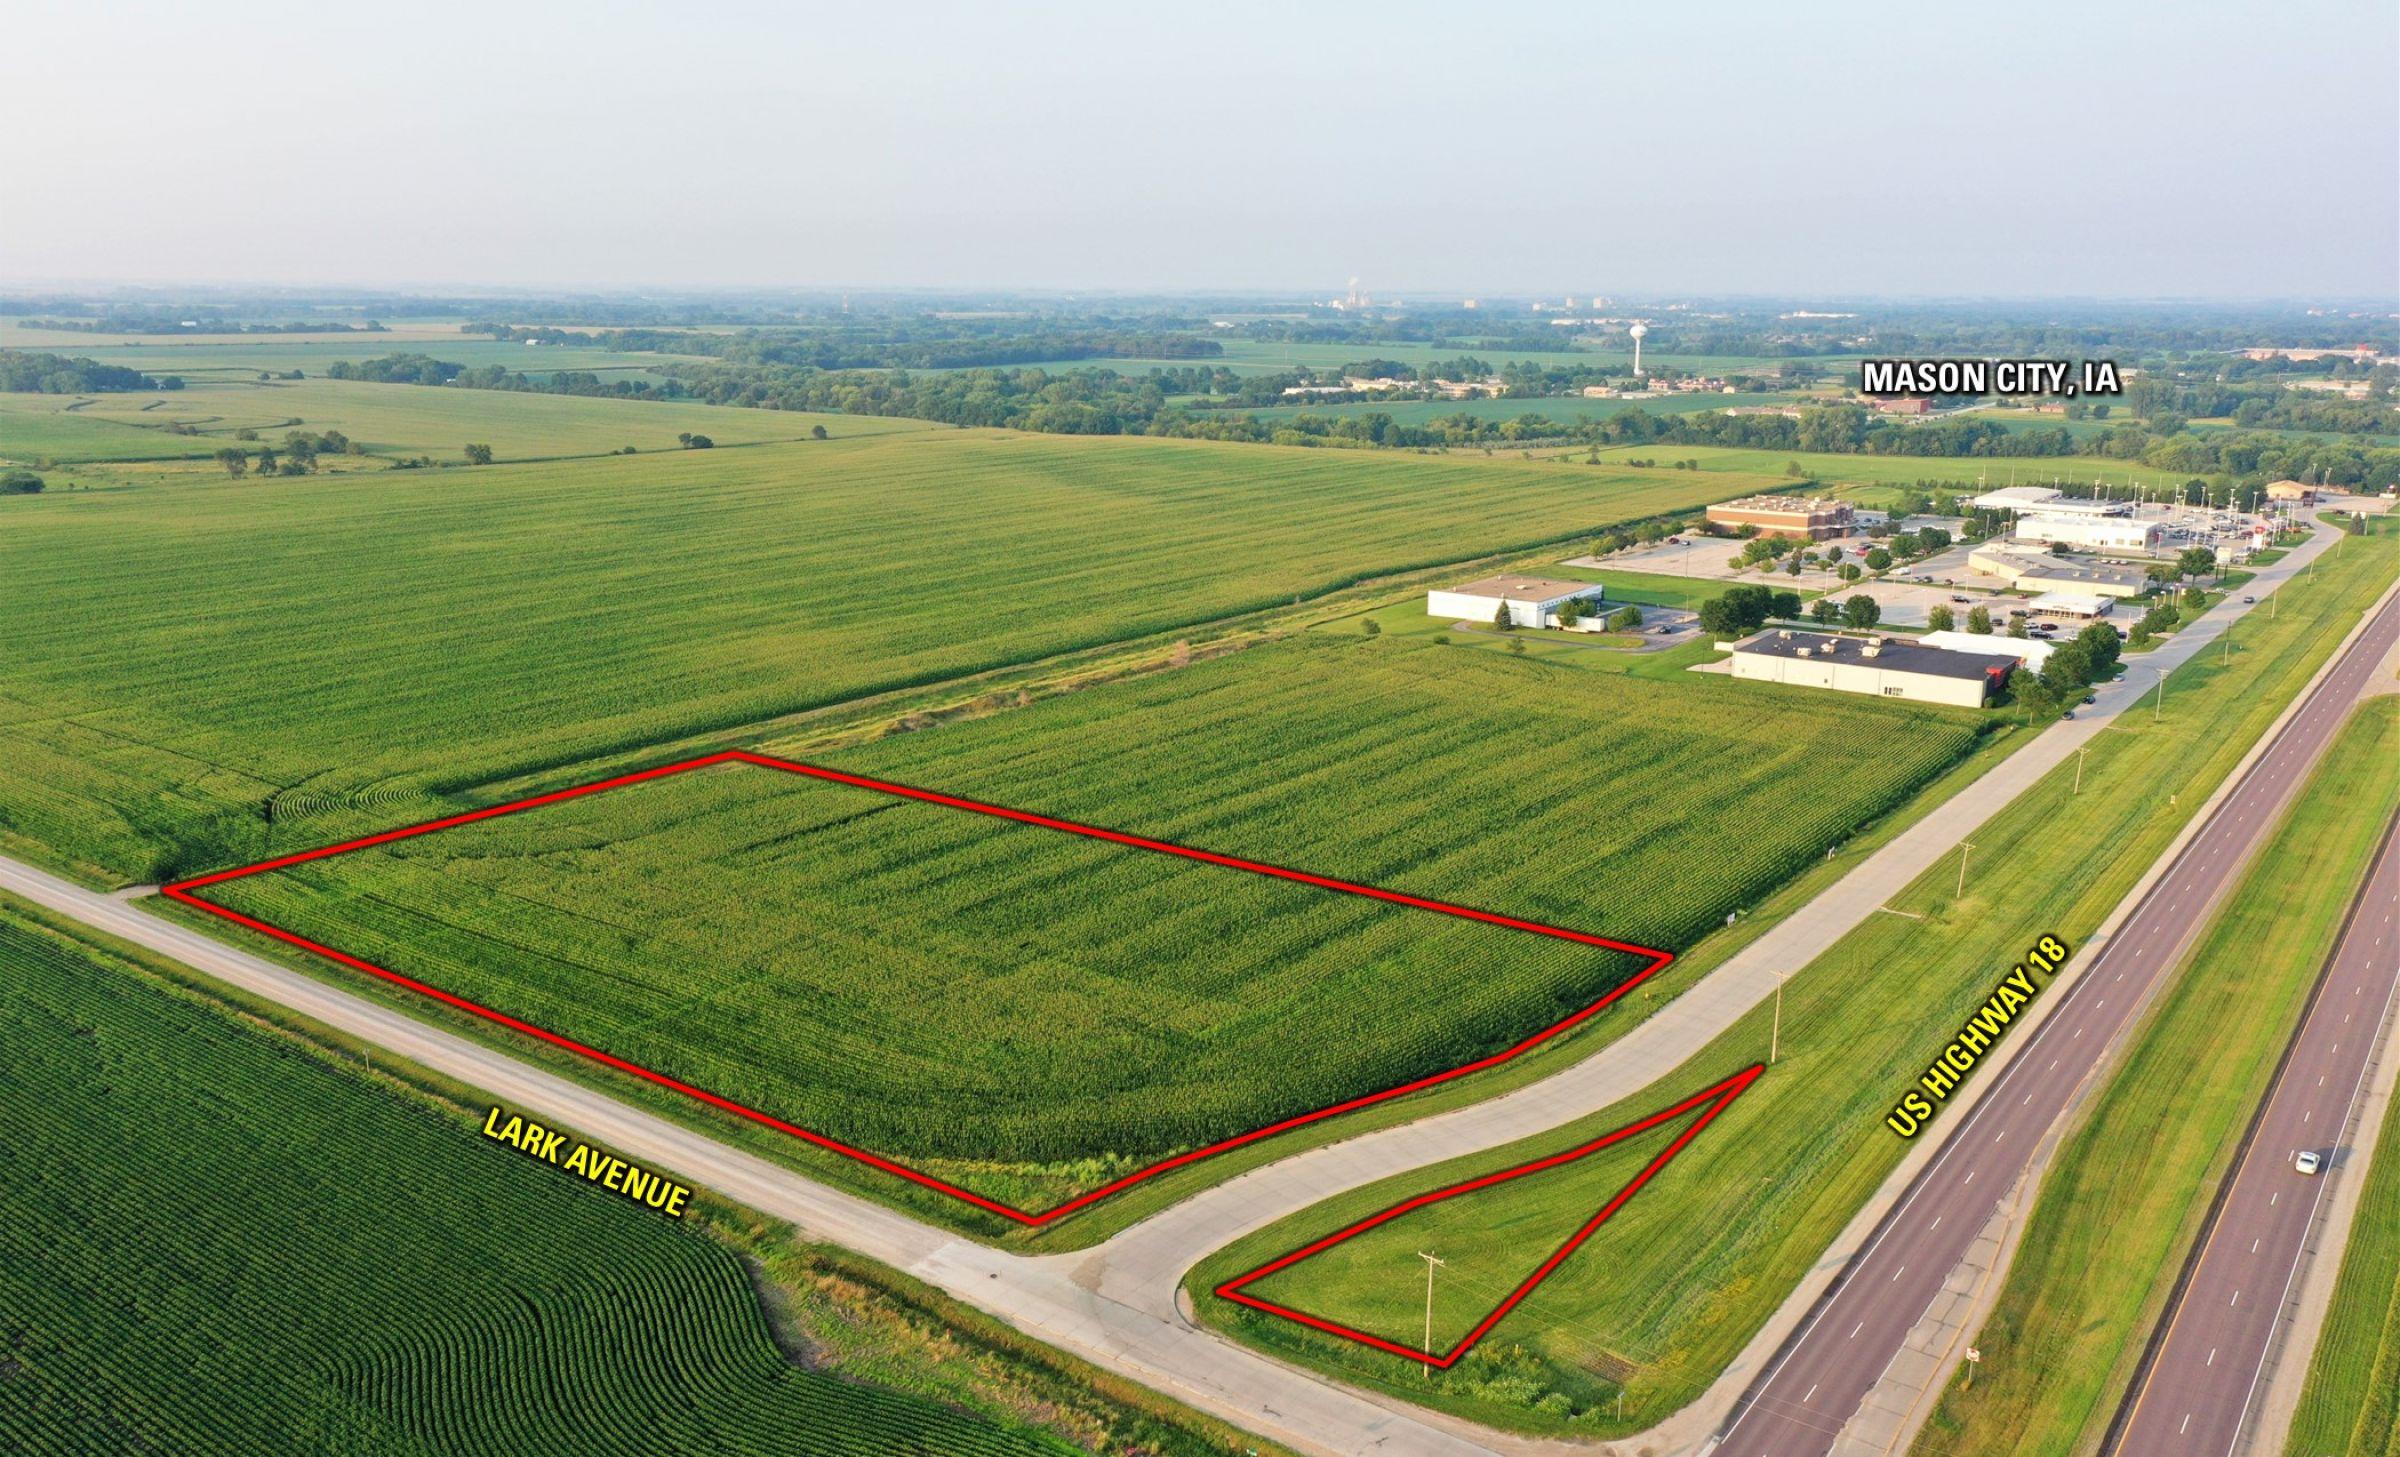 development-land-commercial-cerro-gordo-county-iowa-4-acres-listing-number-15642-0-2021-07-20-212445.jpg